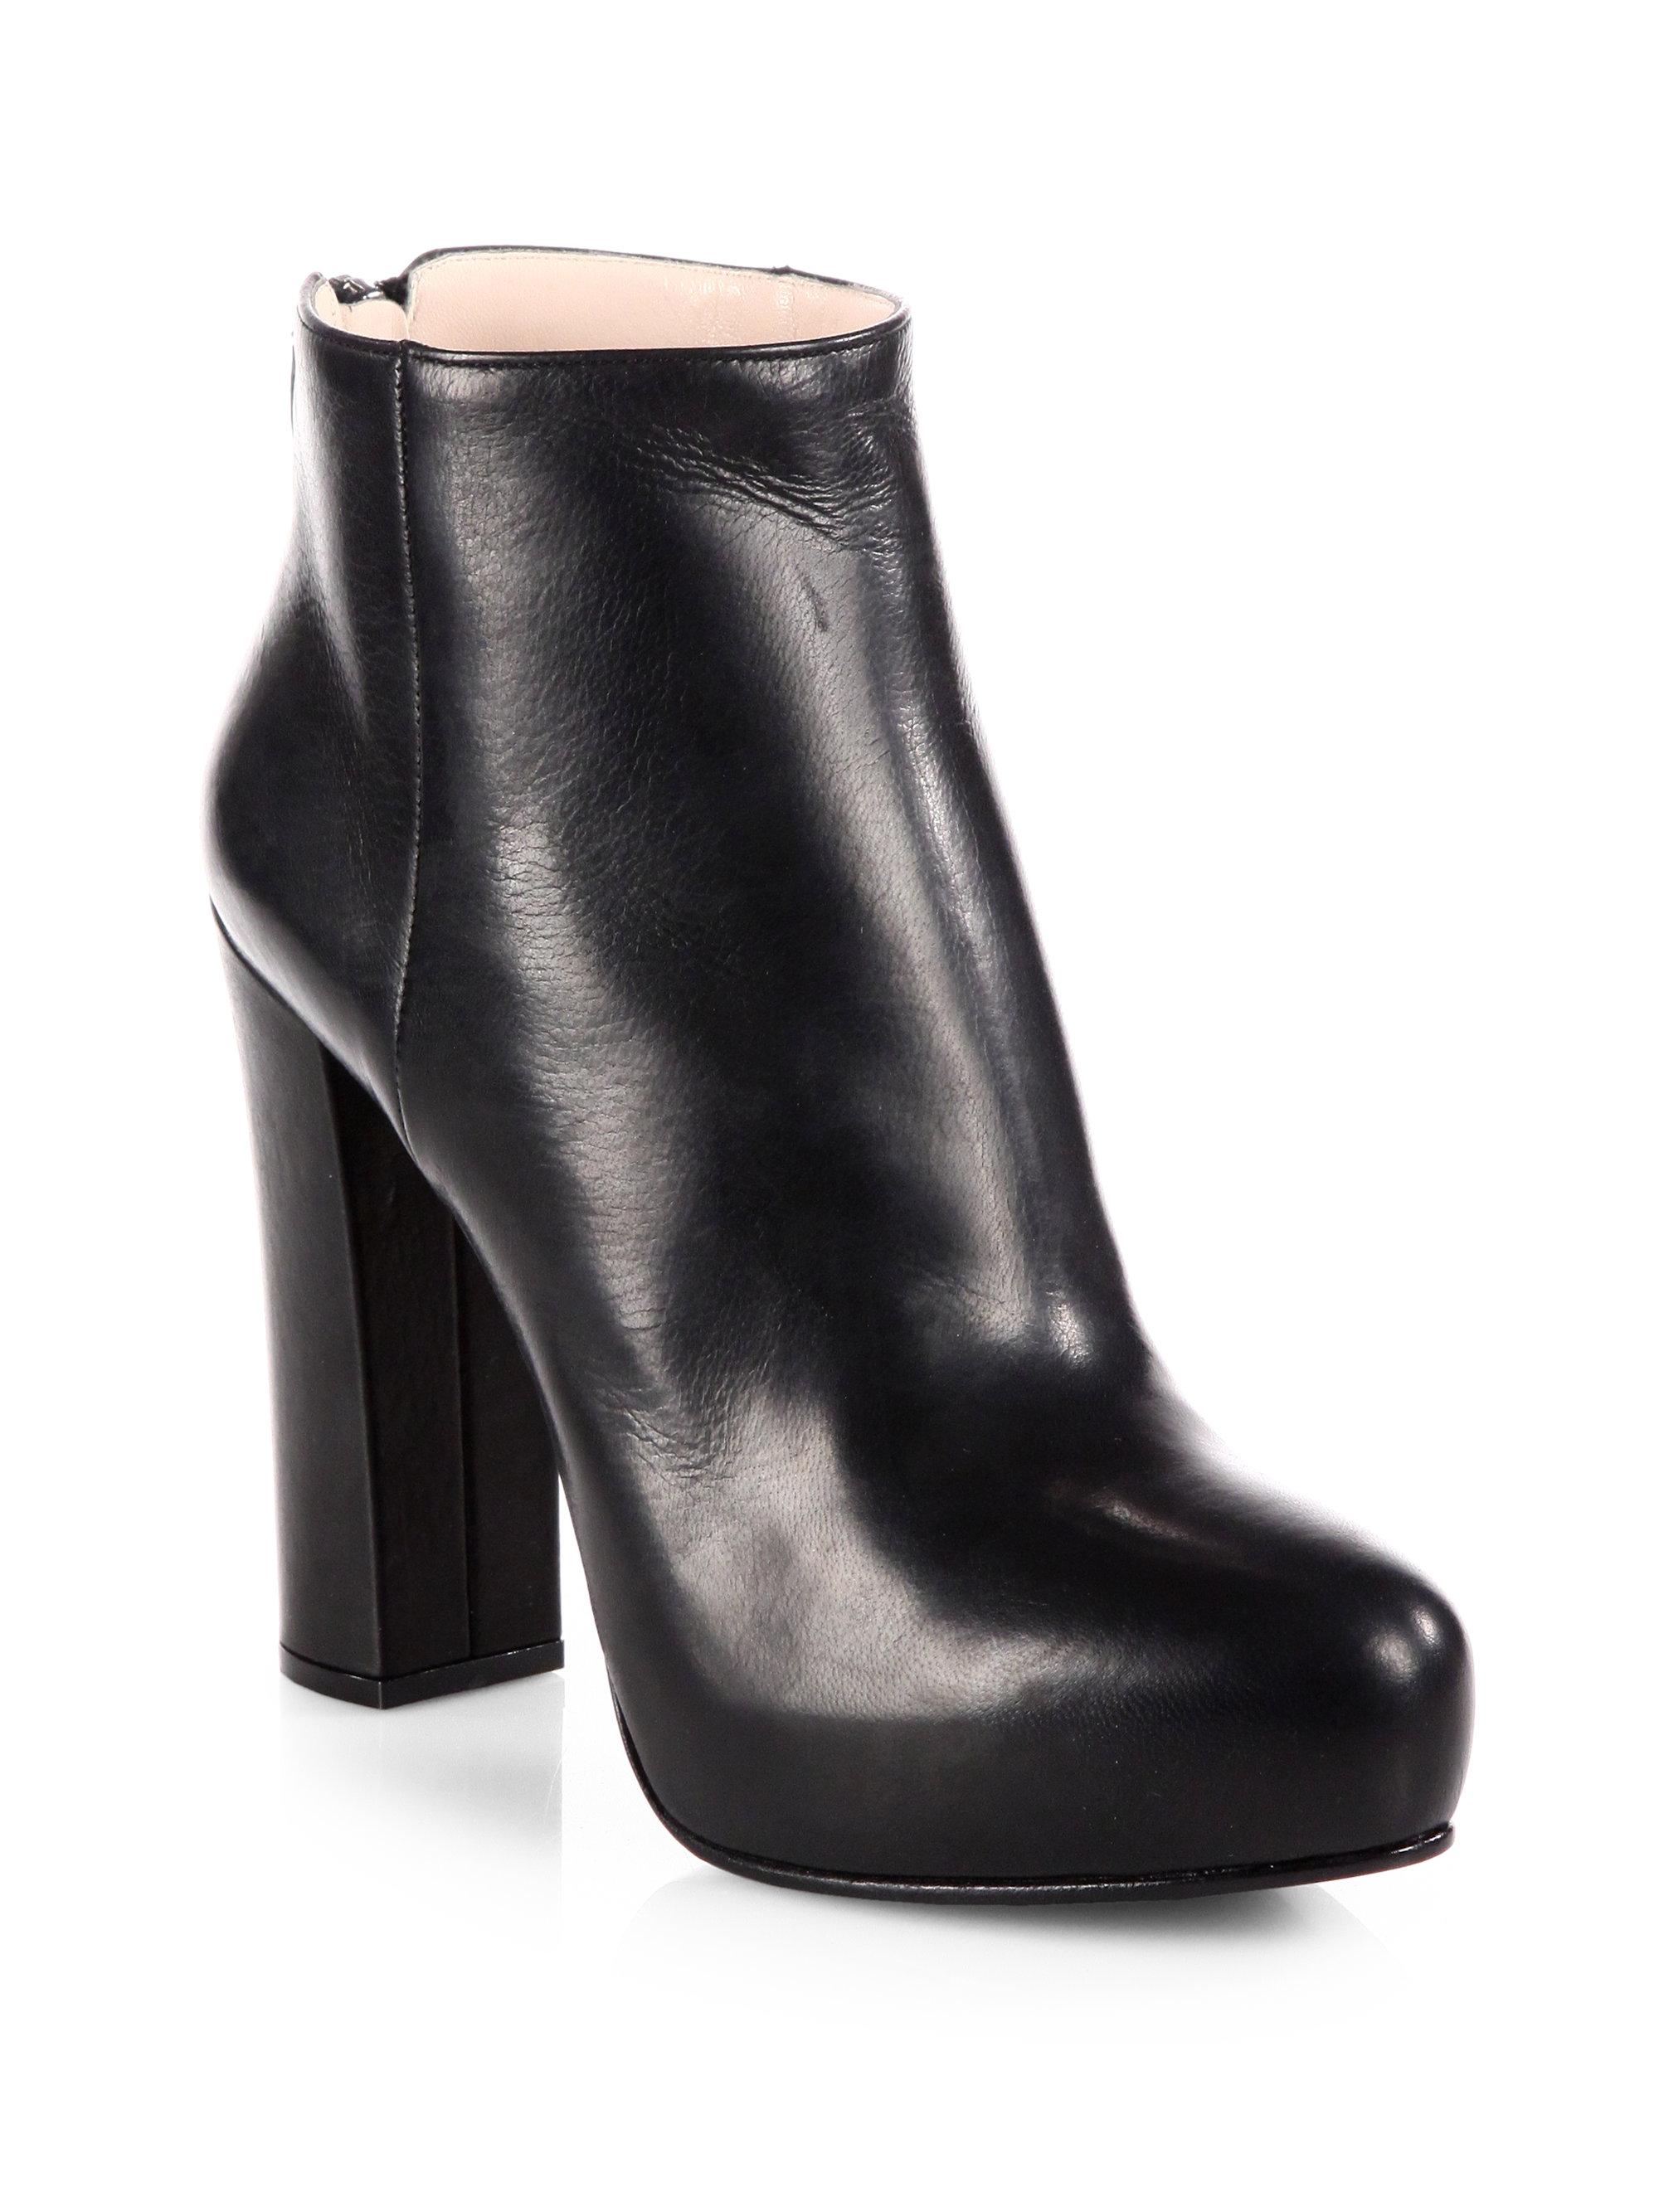 f3c6b2fa47 Prada Black Leather Platform Ankle Boots